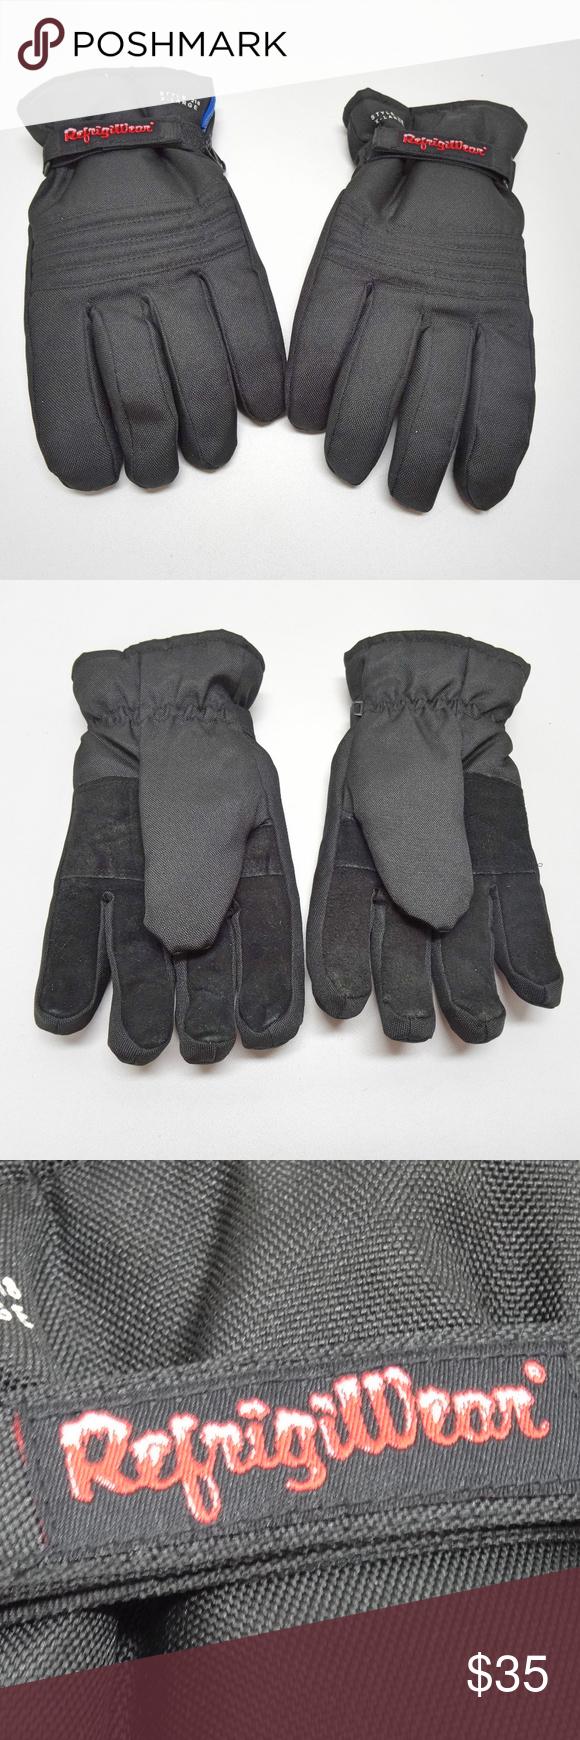 3d39cfc83d3b9 RefrigiWear  218 Mens XL Gloves REFRIGIWEAR STYLE 218 MENS WINTER COLD  WEATHER GLOVES SIZE